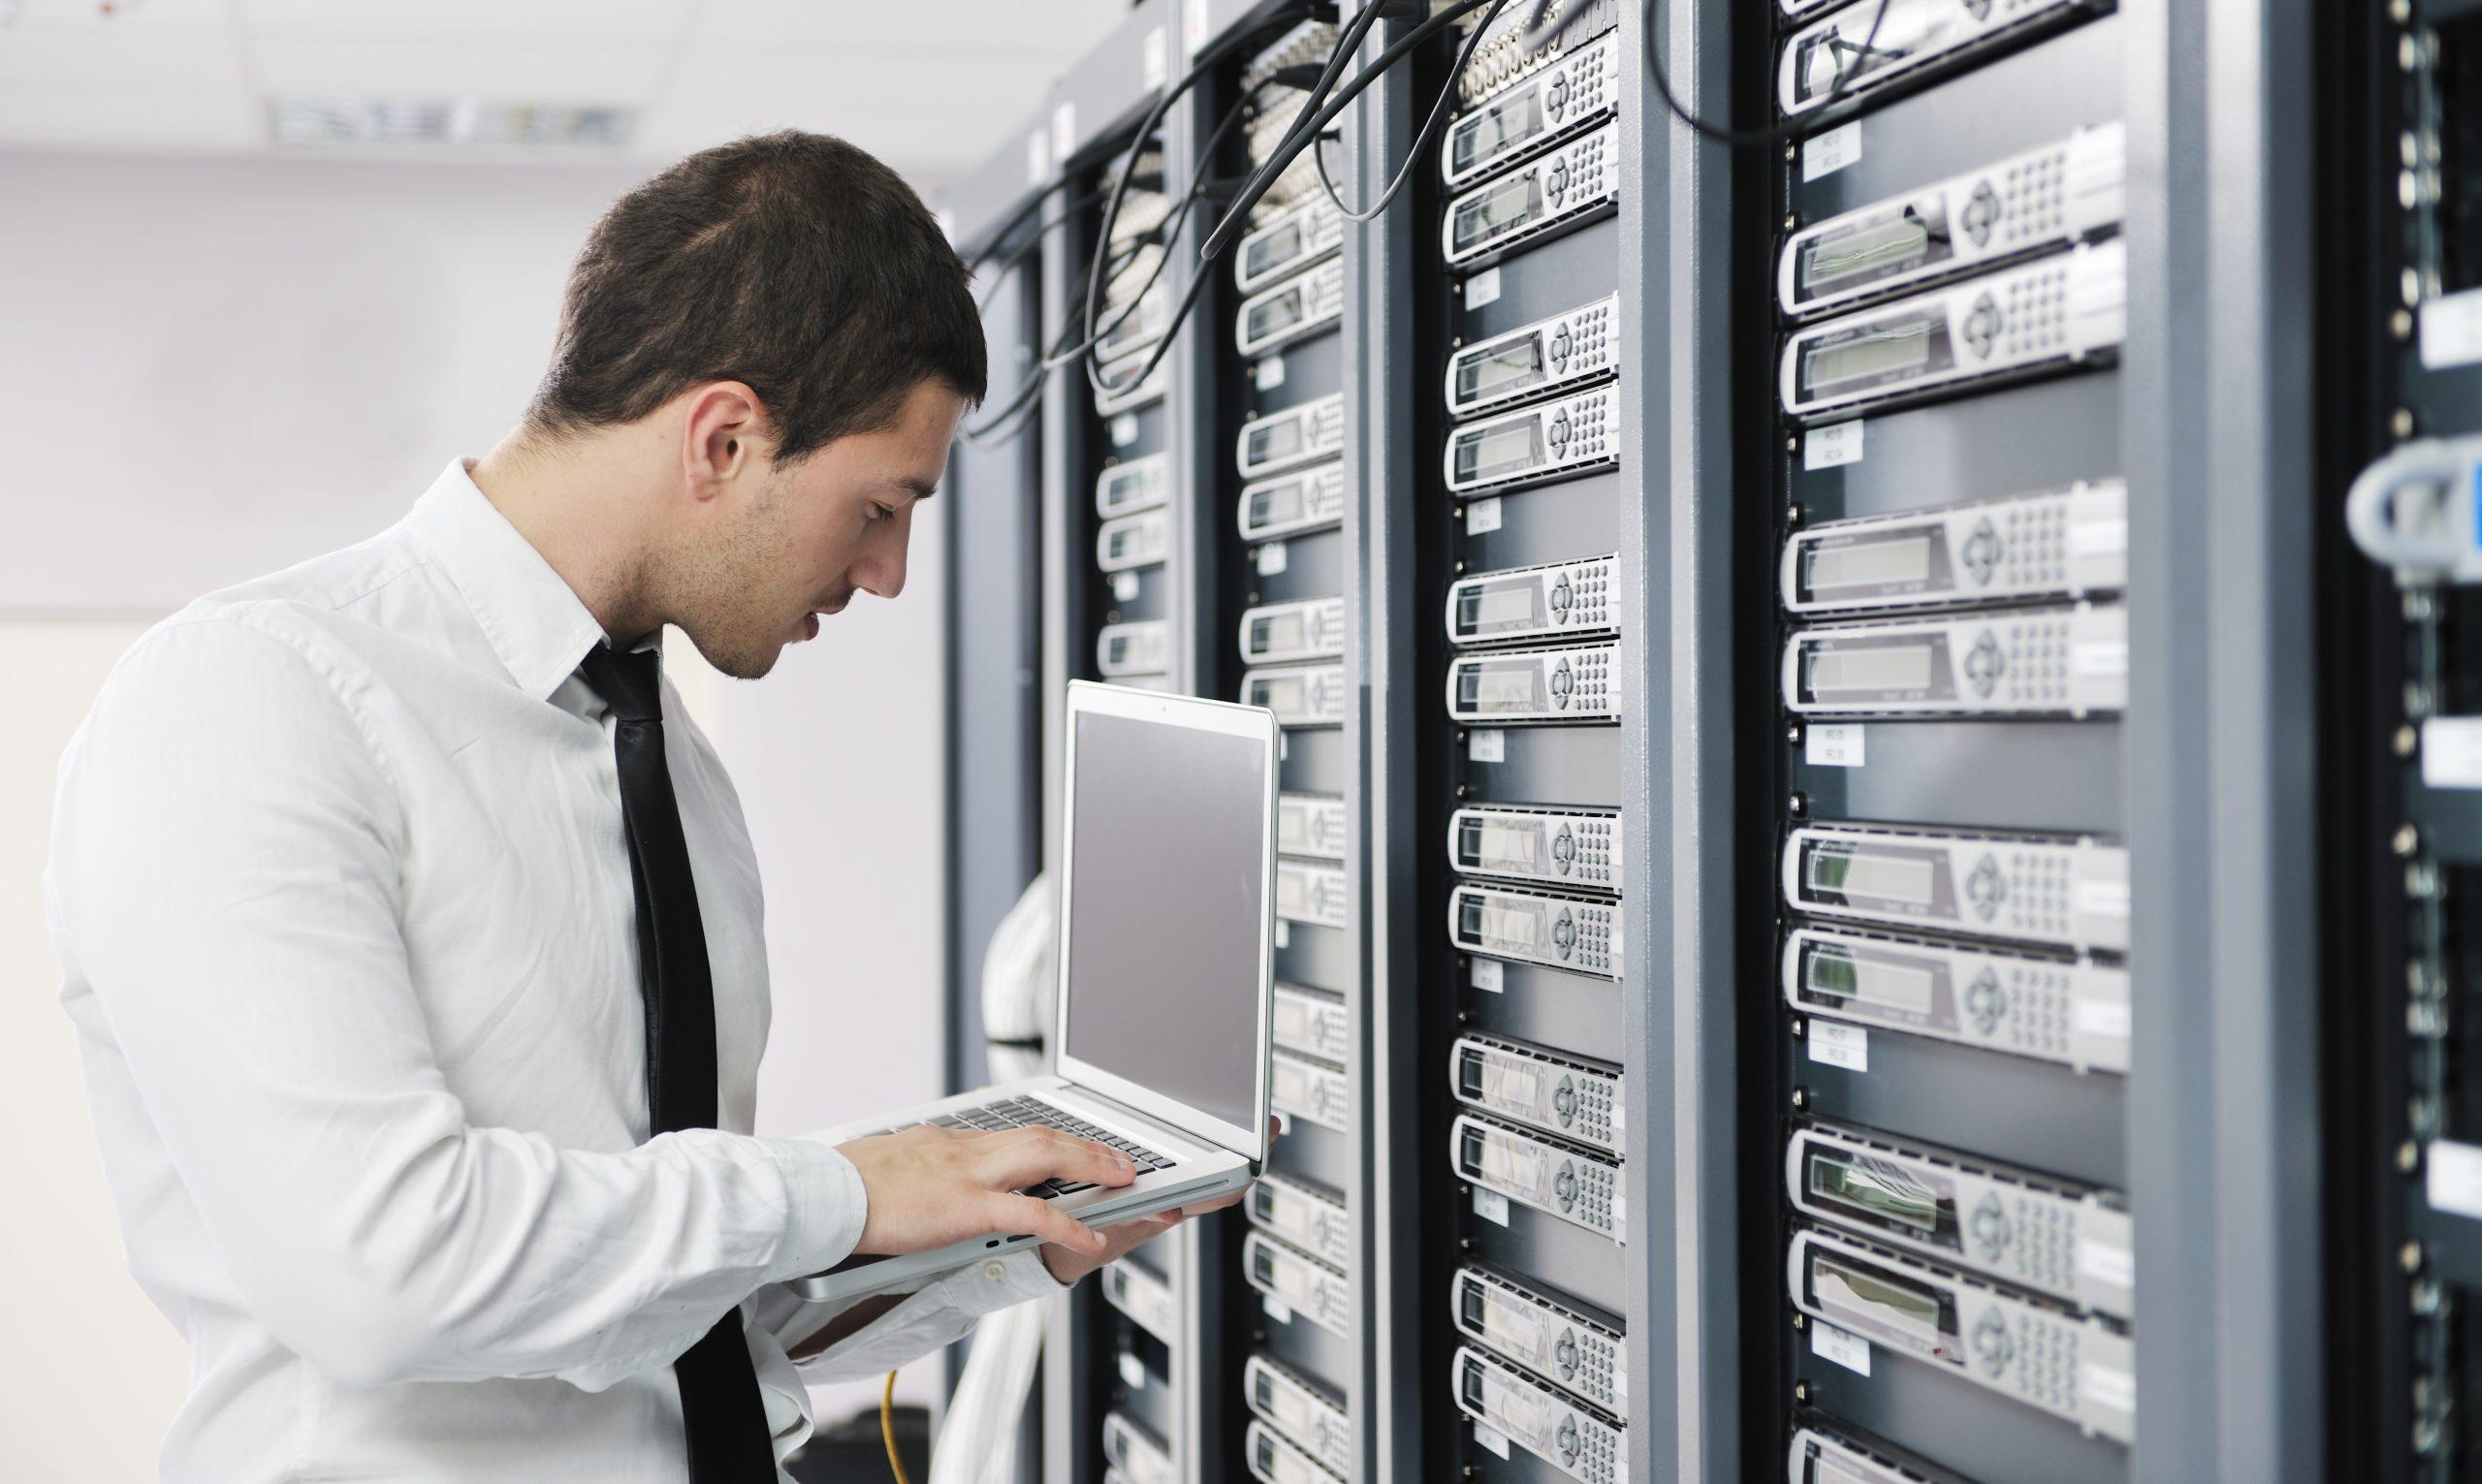 Man using laptop in server room